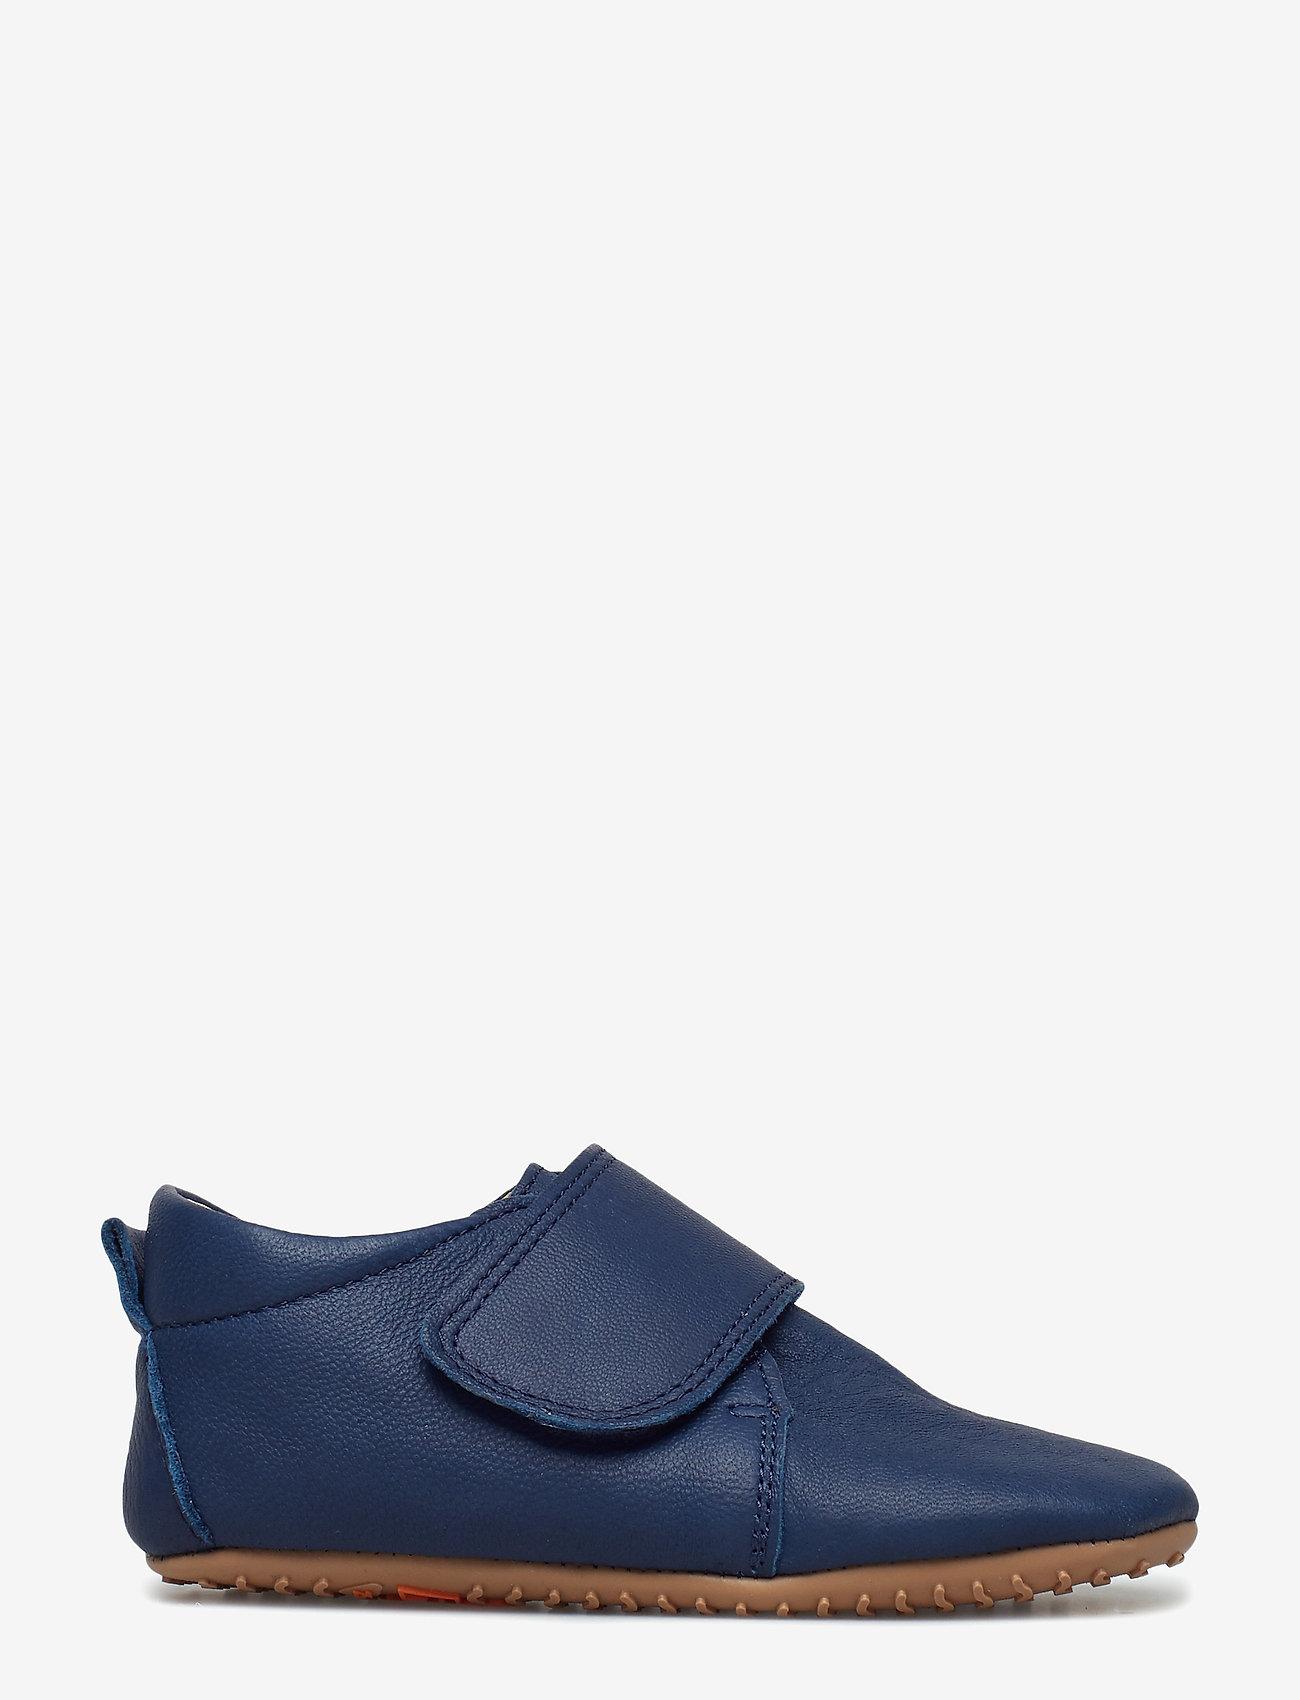 Arauto RAP - HAND MADE BABY BOOT - schuhe - 04-blue - 1